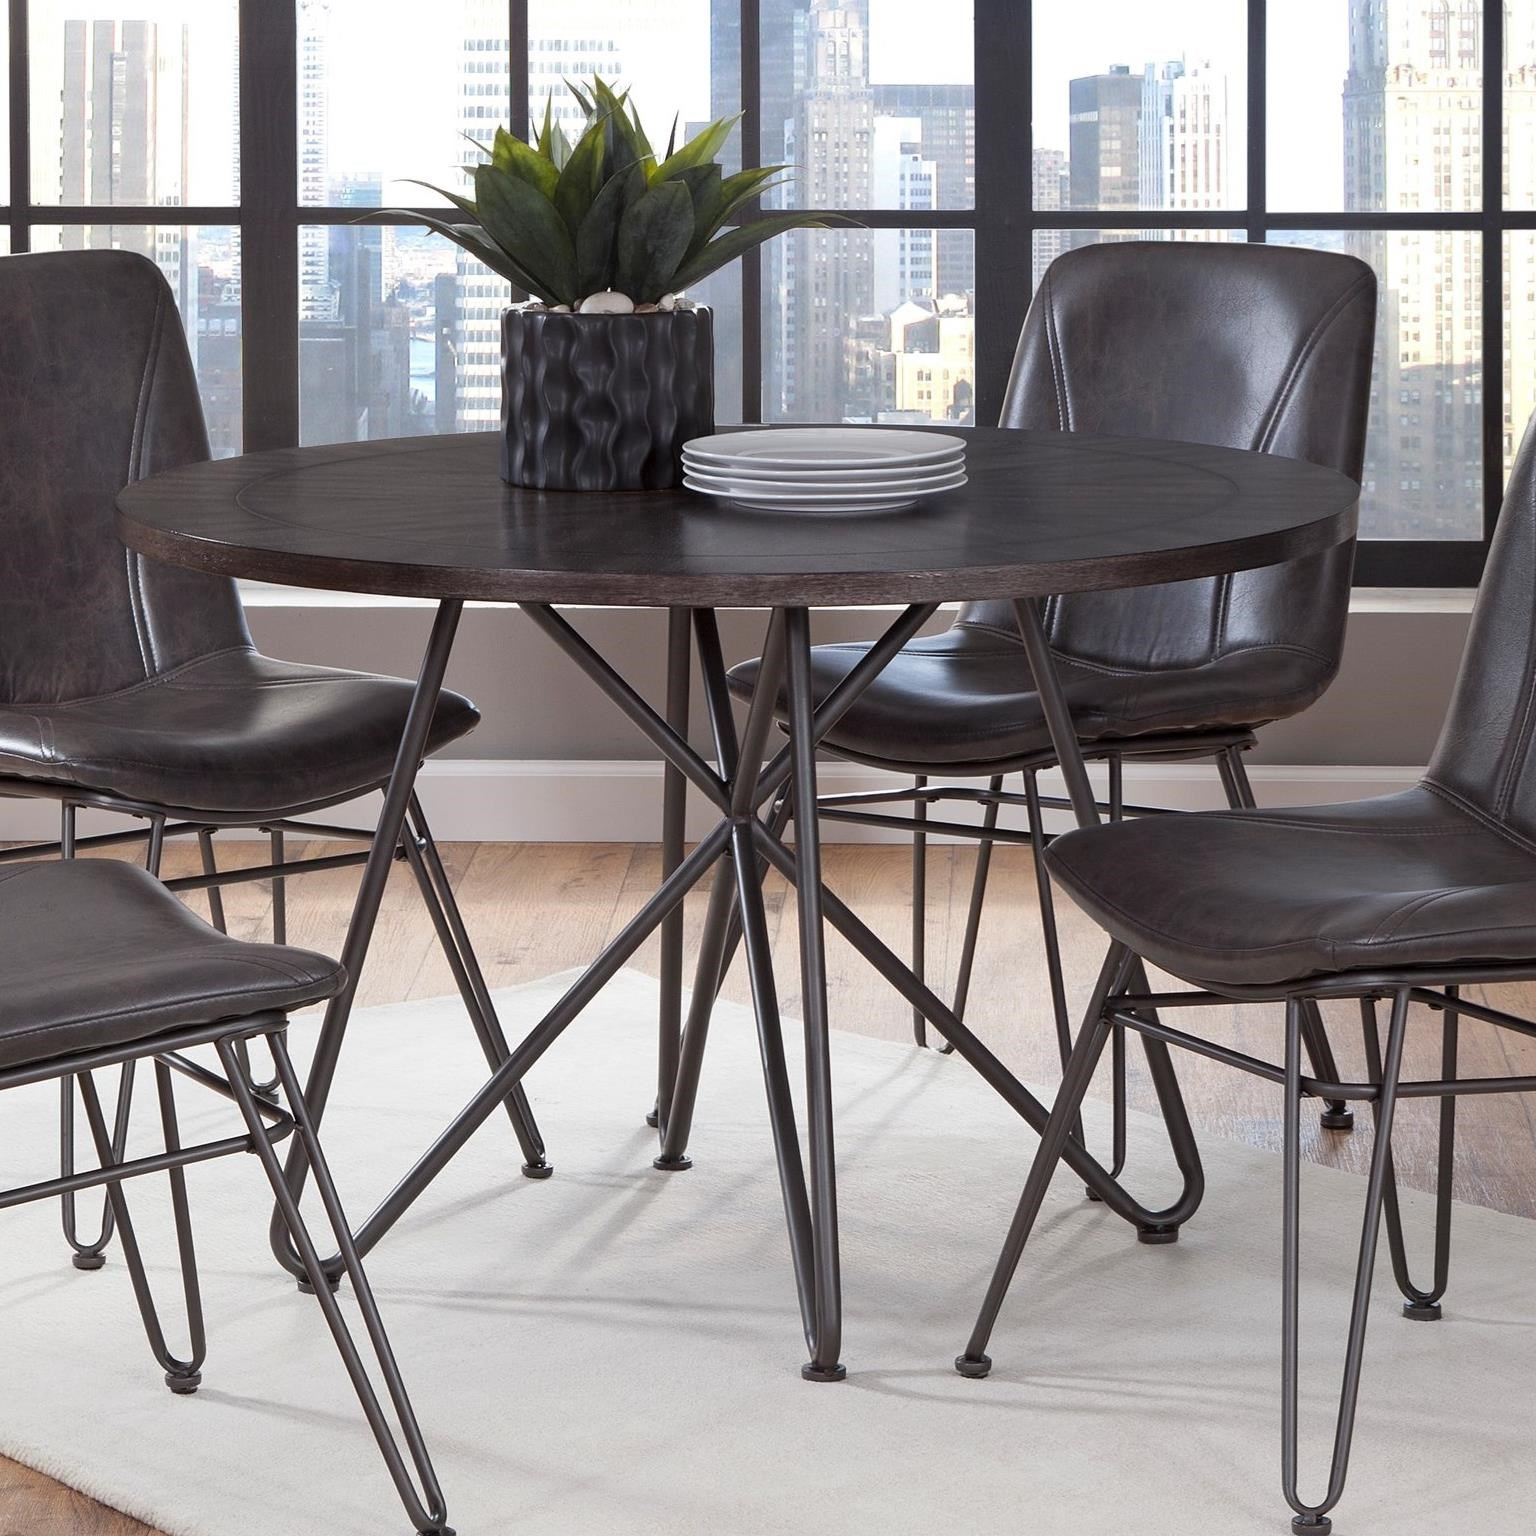 "Derek 45"" Industrial Dining Table by Steve Silver at Walker's Furniture"